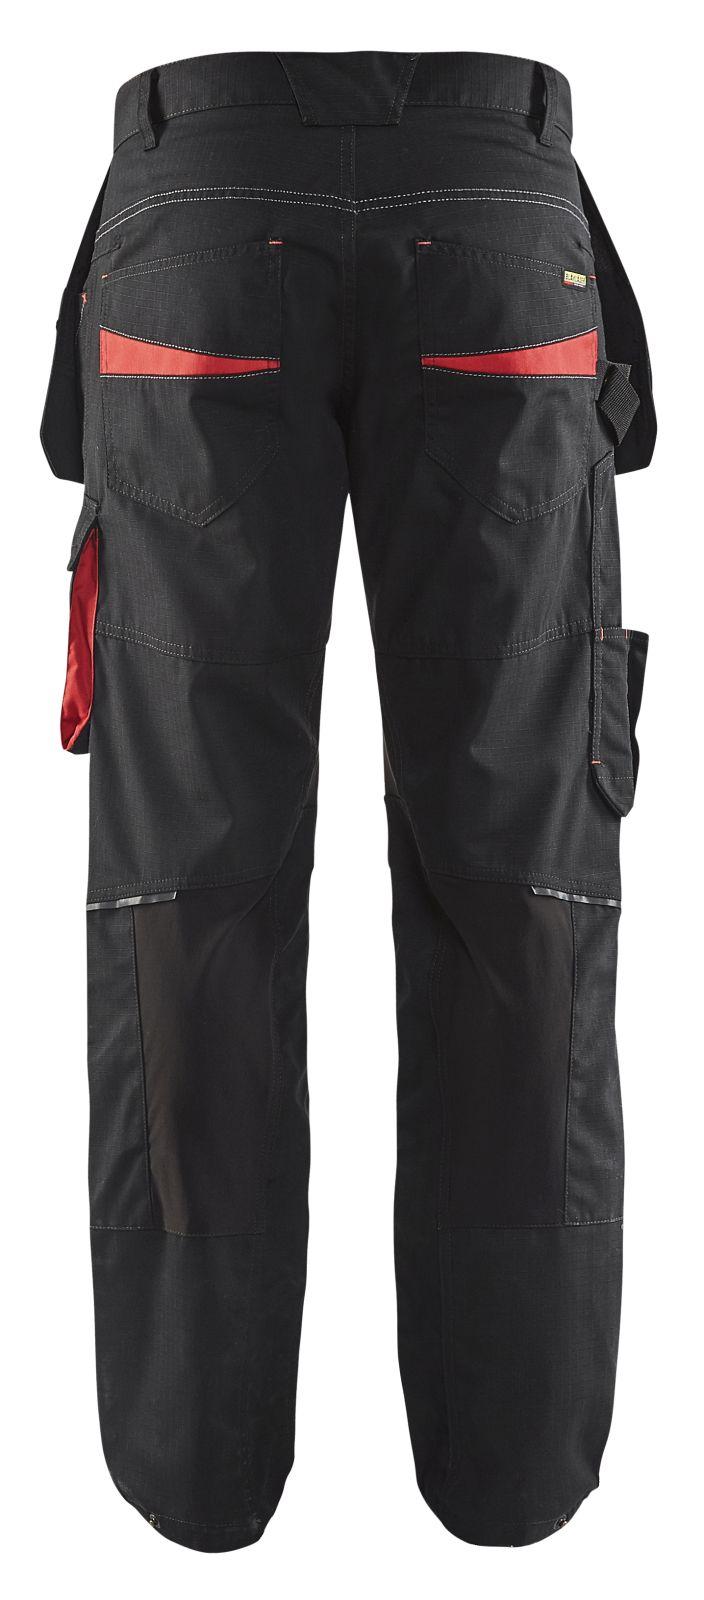 Blaklader Werkbroeken 14961330 met Stretch zwart-rood(9956)